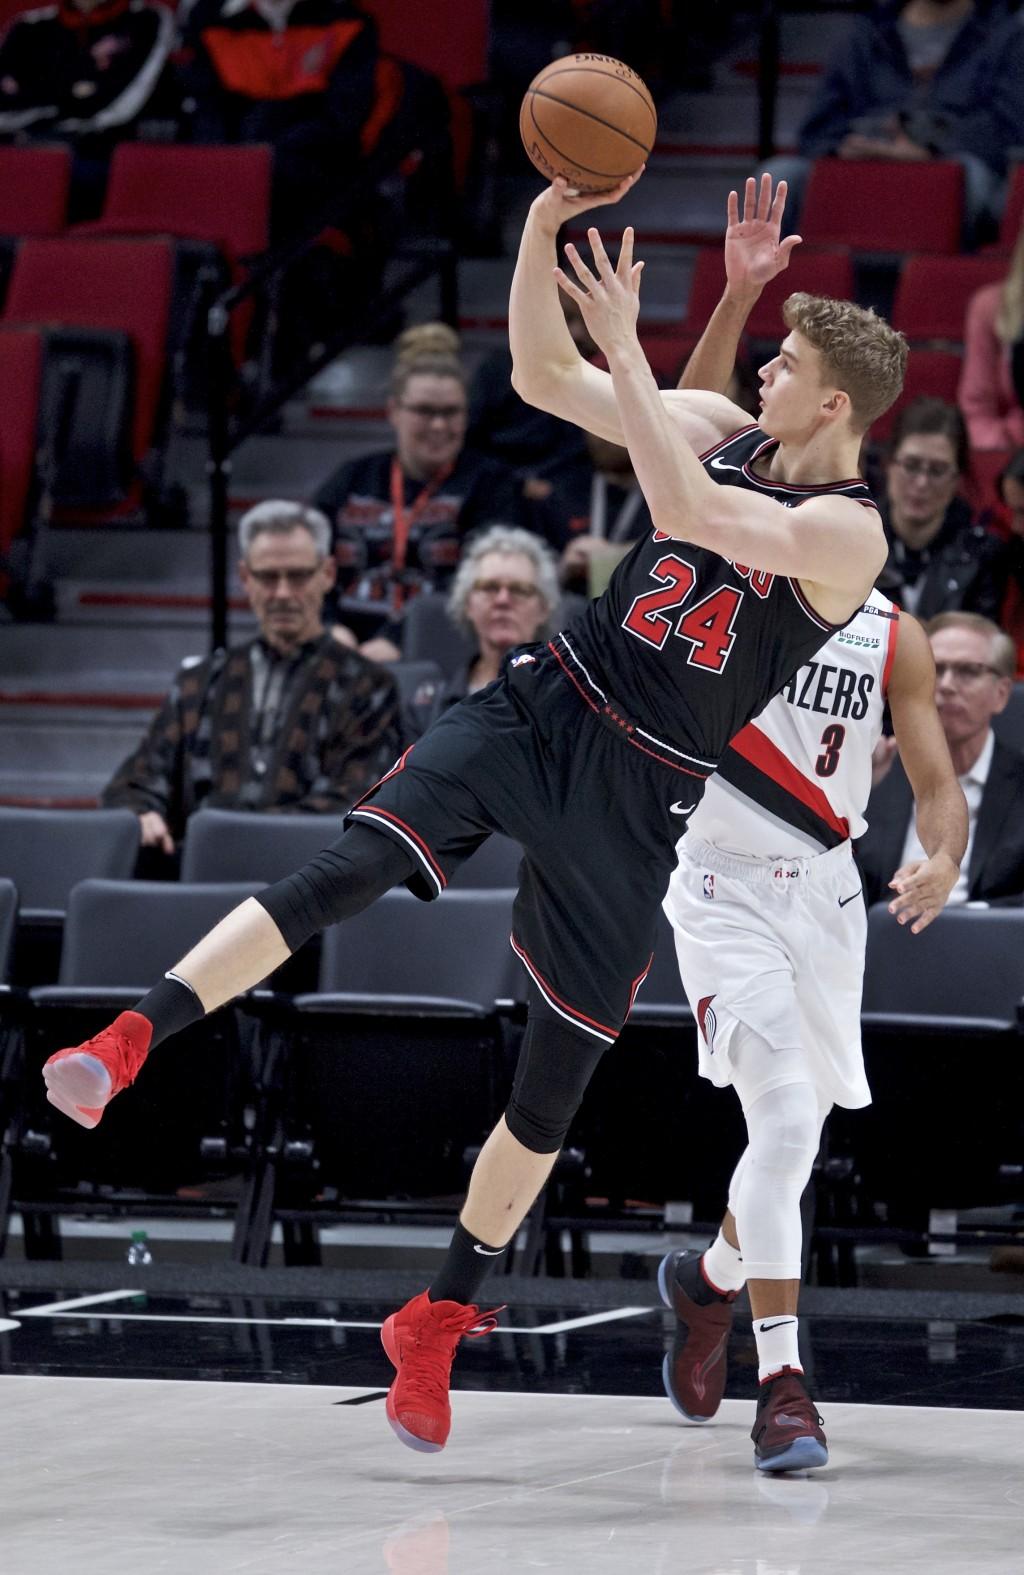 Chicago Bulls forward Lauri Markkanen, front, shoots over Portland Trail Blazers guard CJ McCollum during the first half of an NBA basketball game in